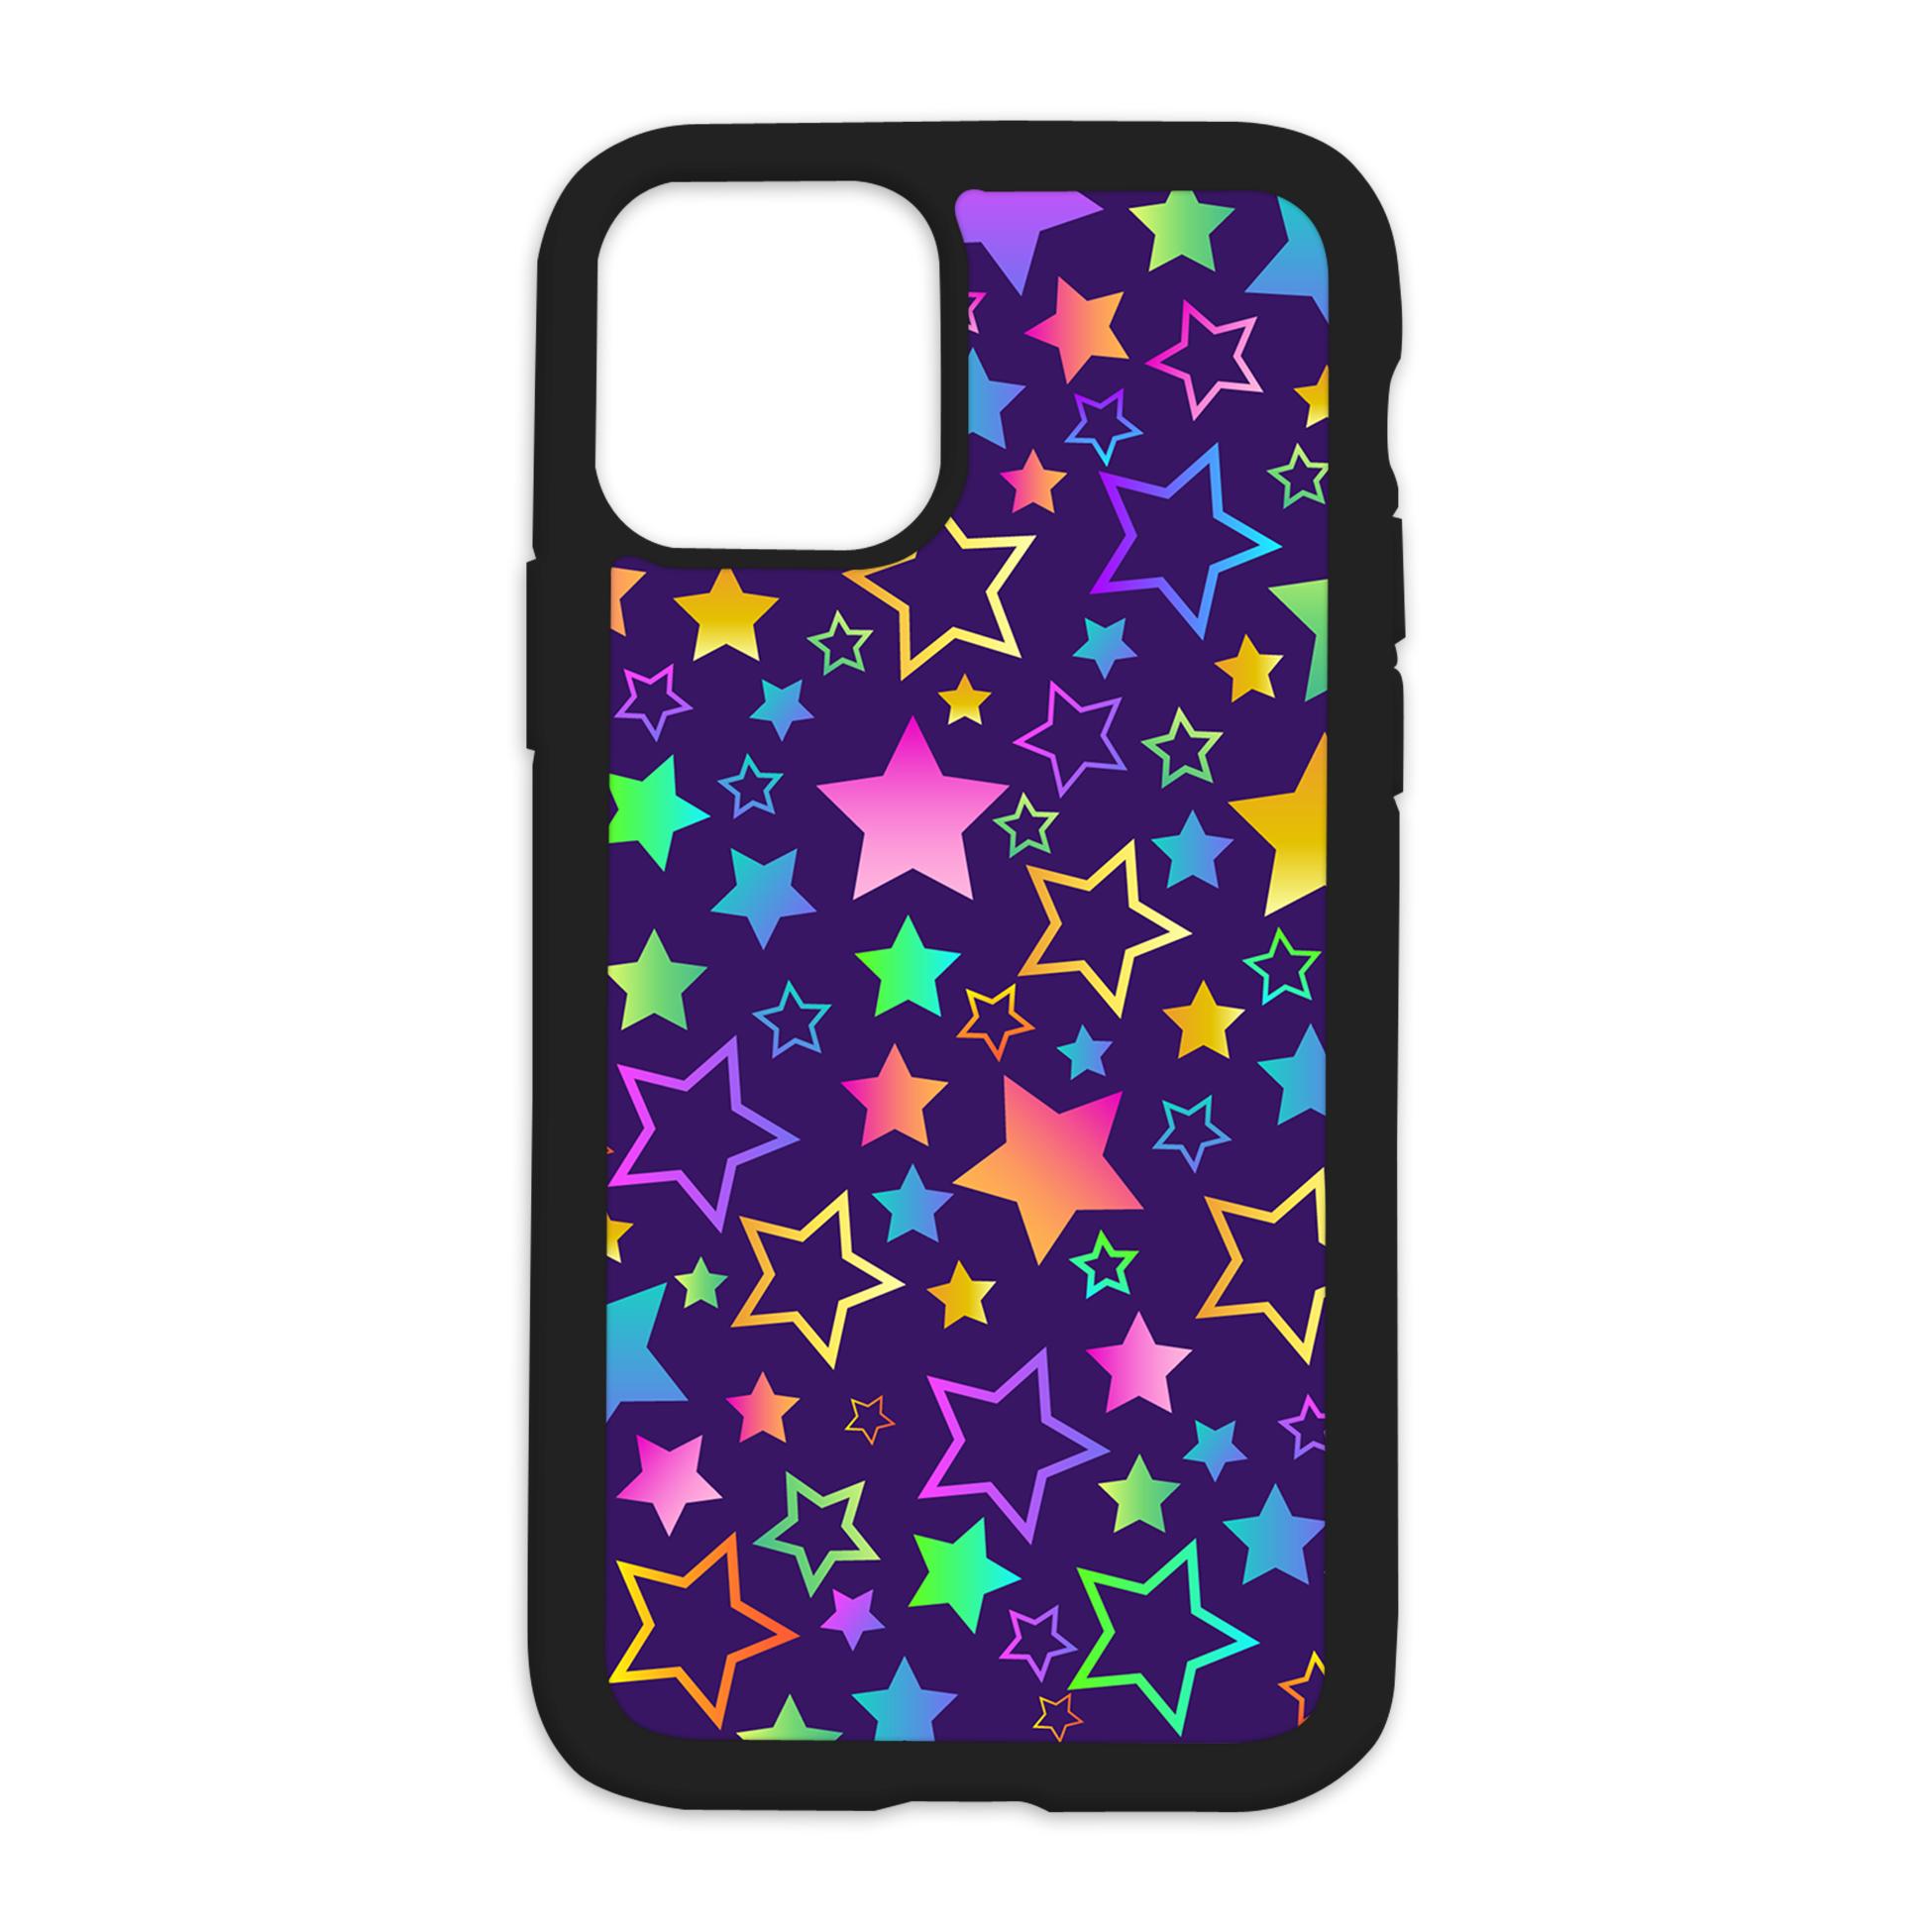 Colorful Stars Design On Black Phone Case - XS MAX / Purple